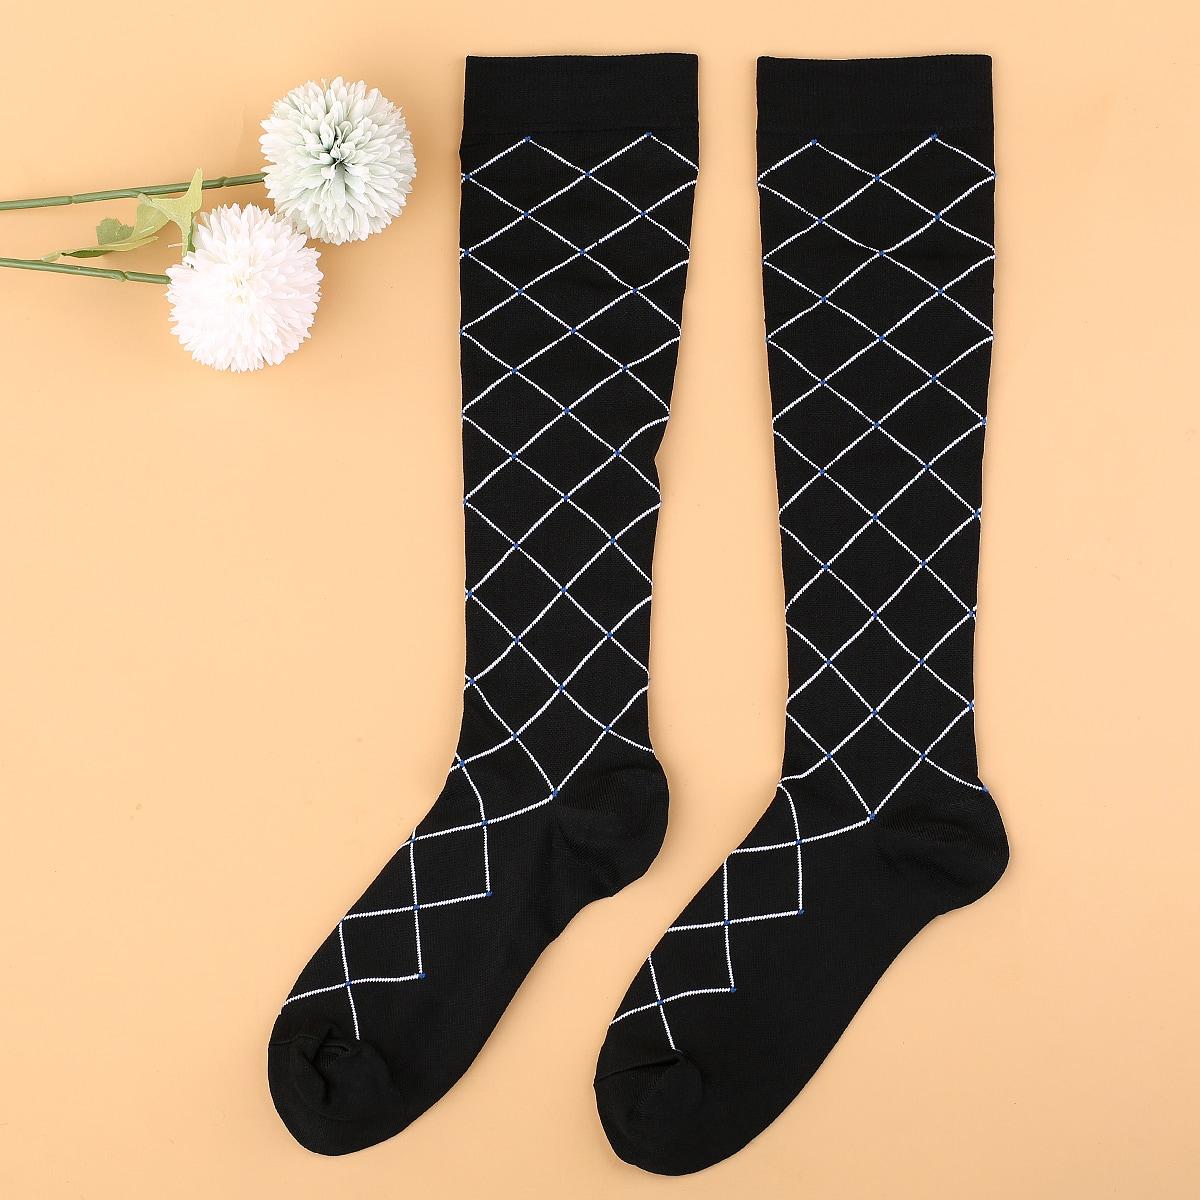 Носки выше голени с геометрическим узором